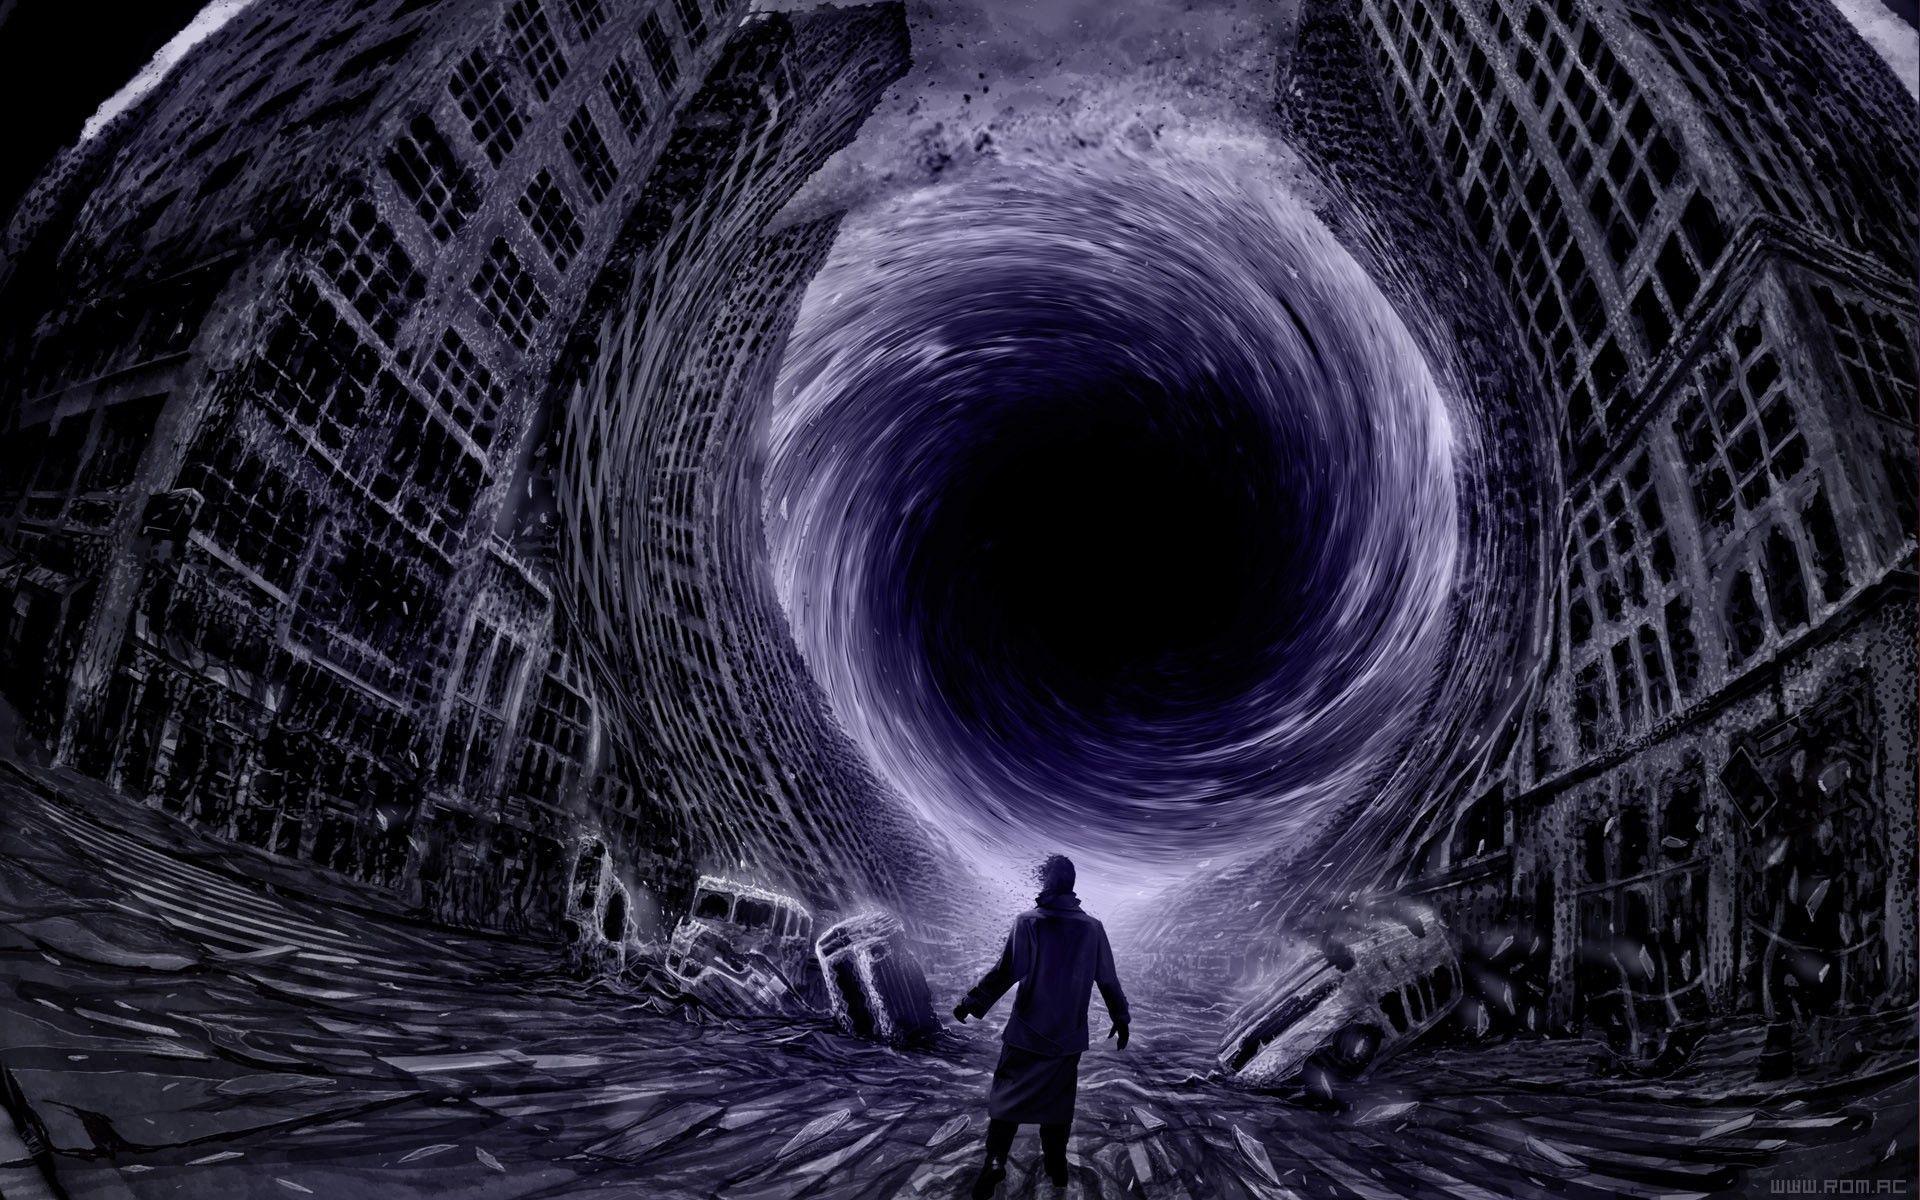 Black-Hole-Image-Download-Free